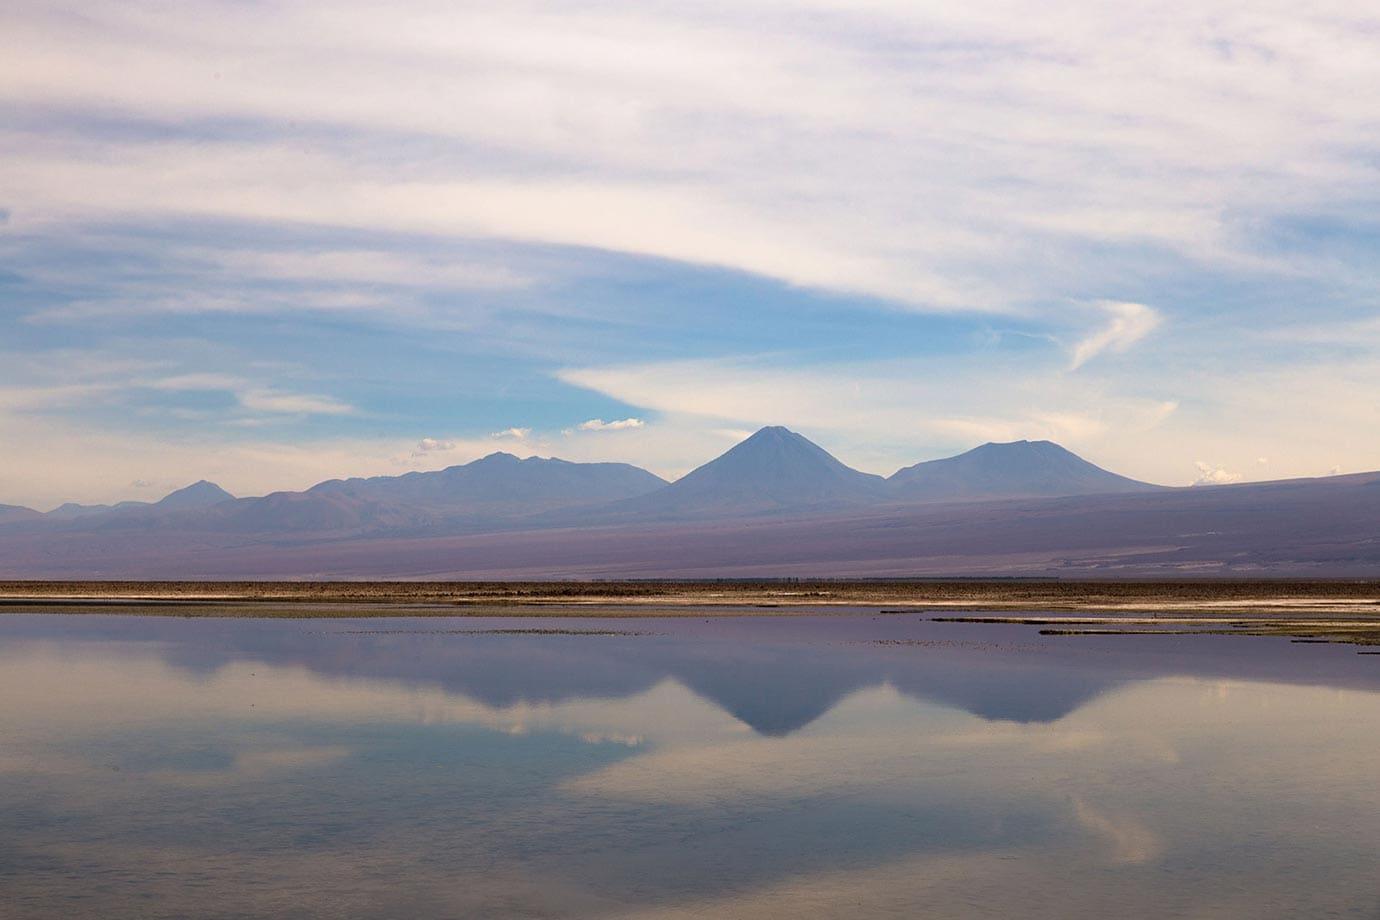 Atacama Desert Tours: Exploring the Lagoons of the Atacama Desert